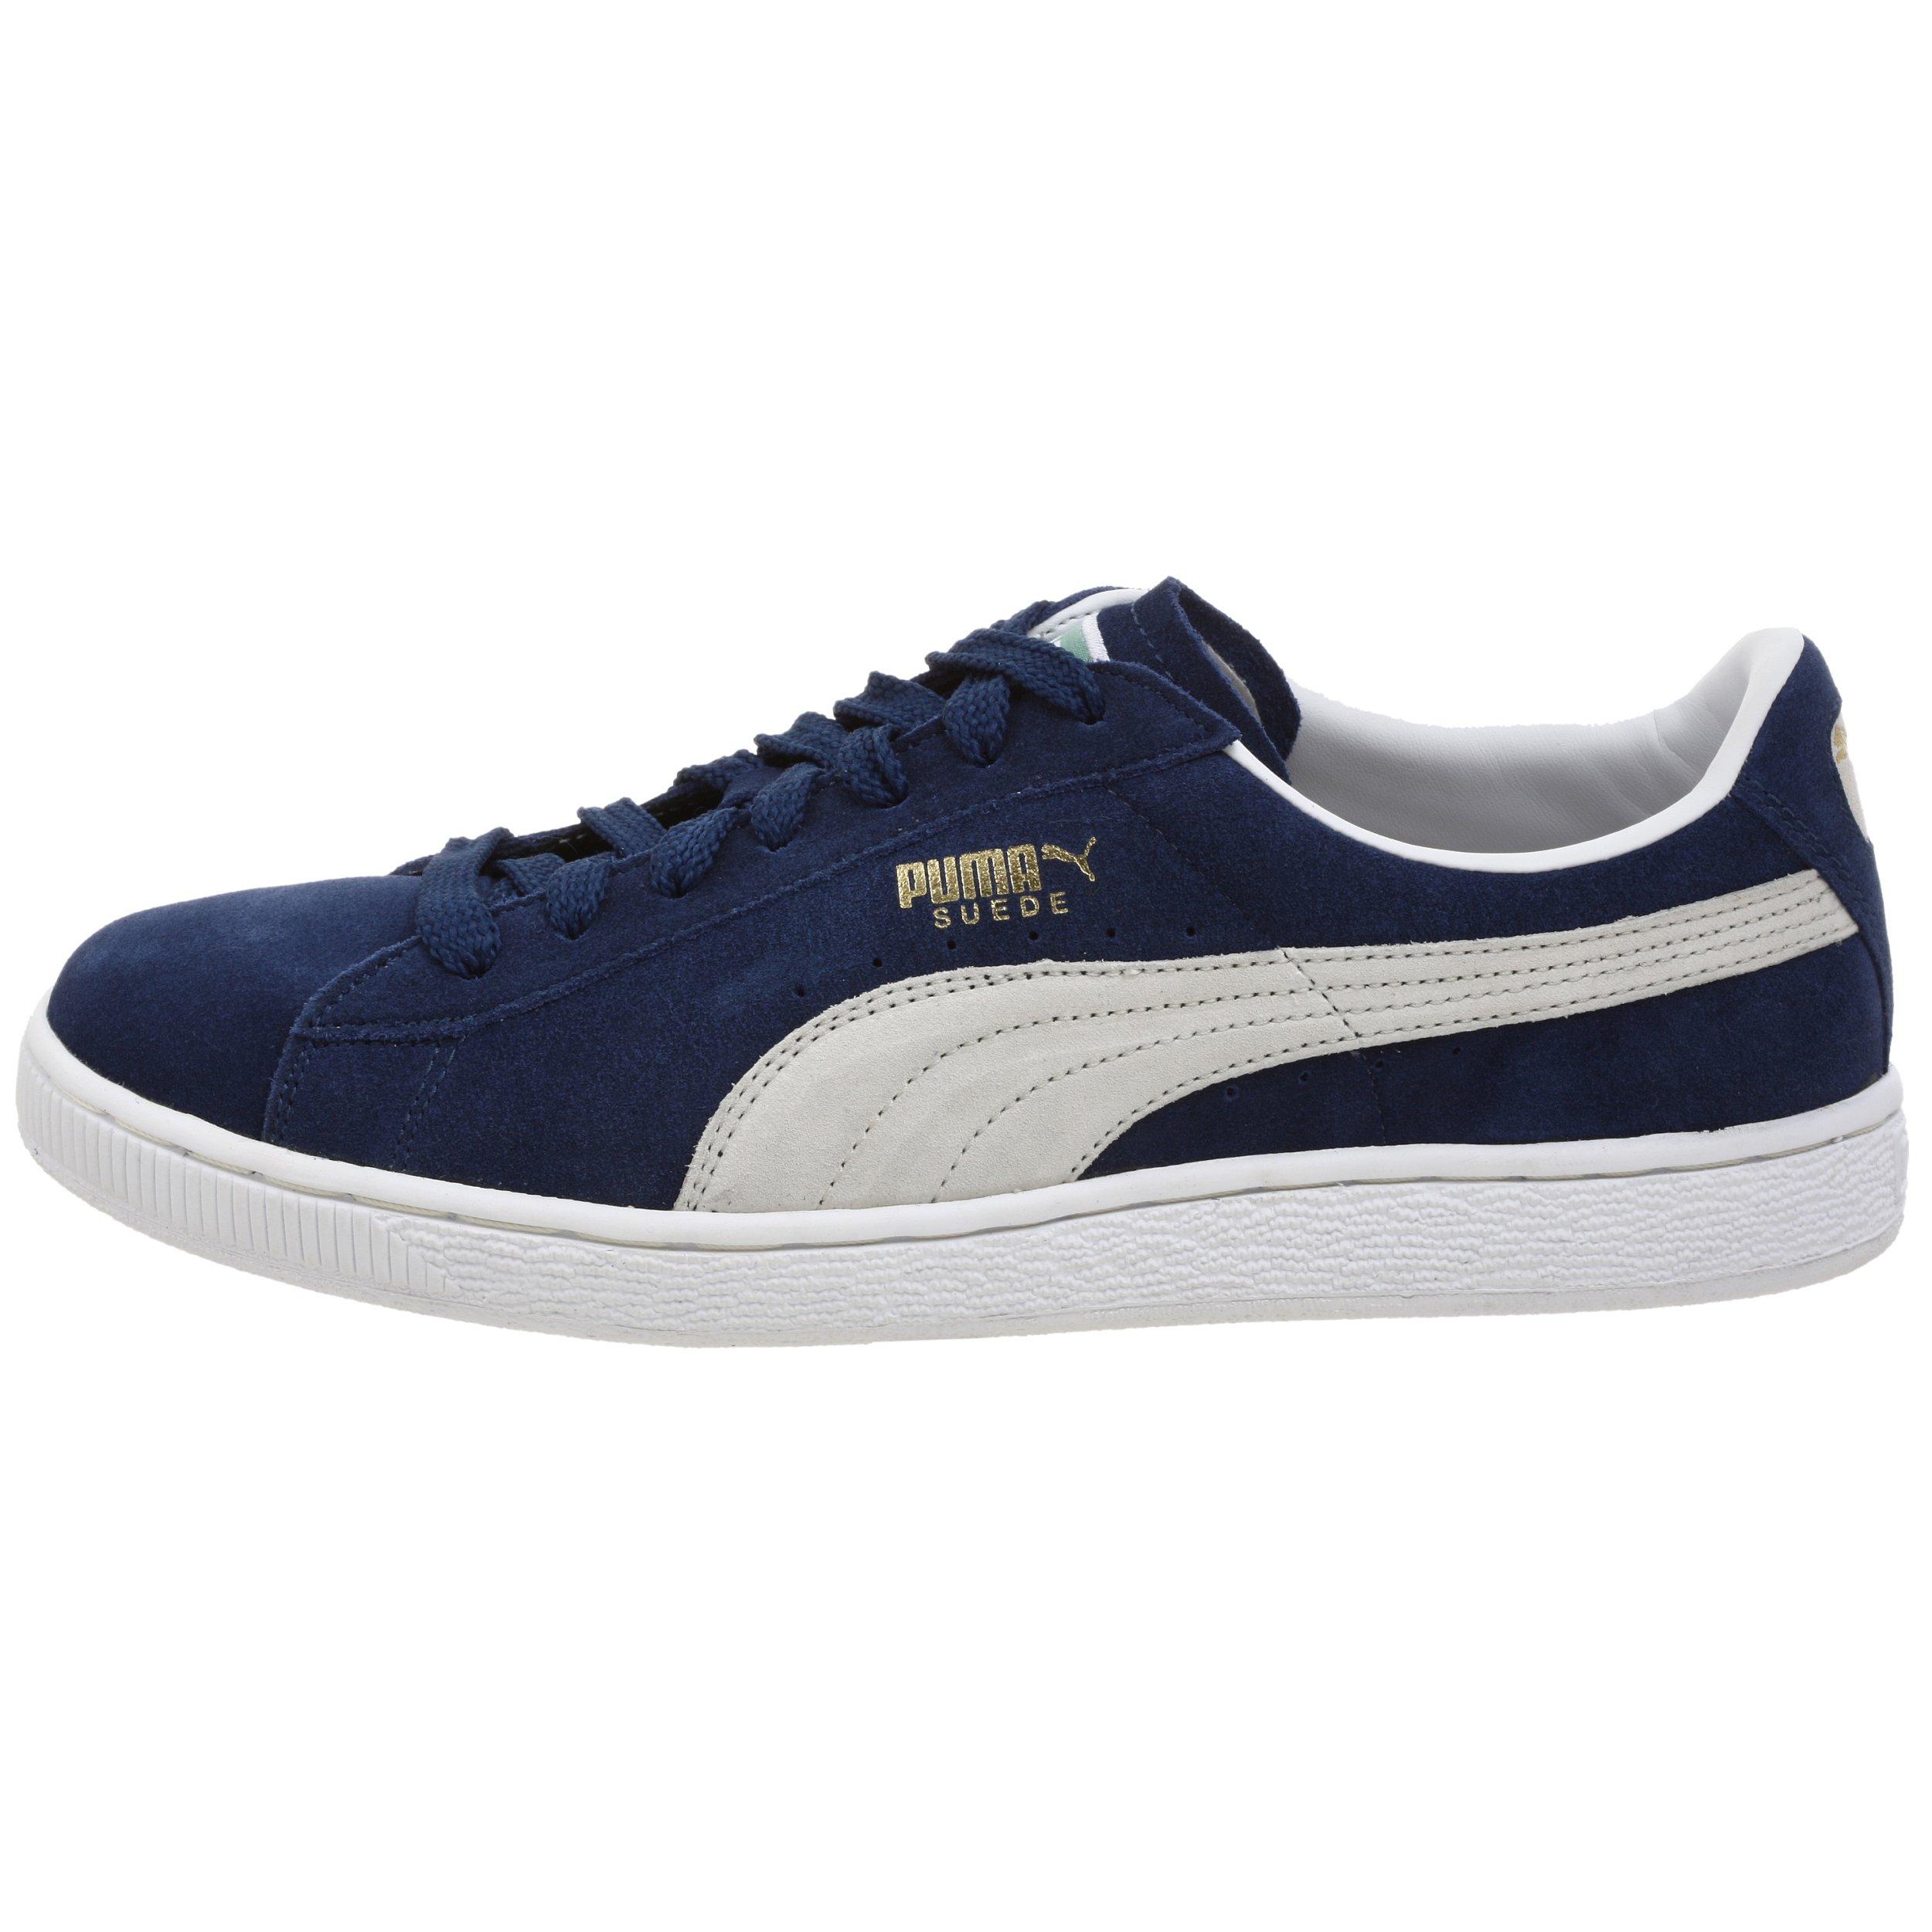 PUMA Suede Classic Sneaker,Blue/White,8 M US Men's by PUMA (Image #5)